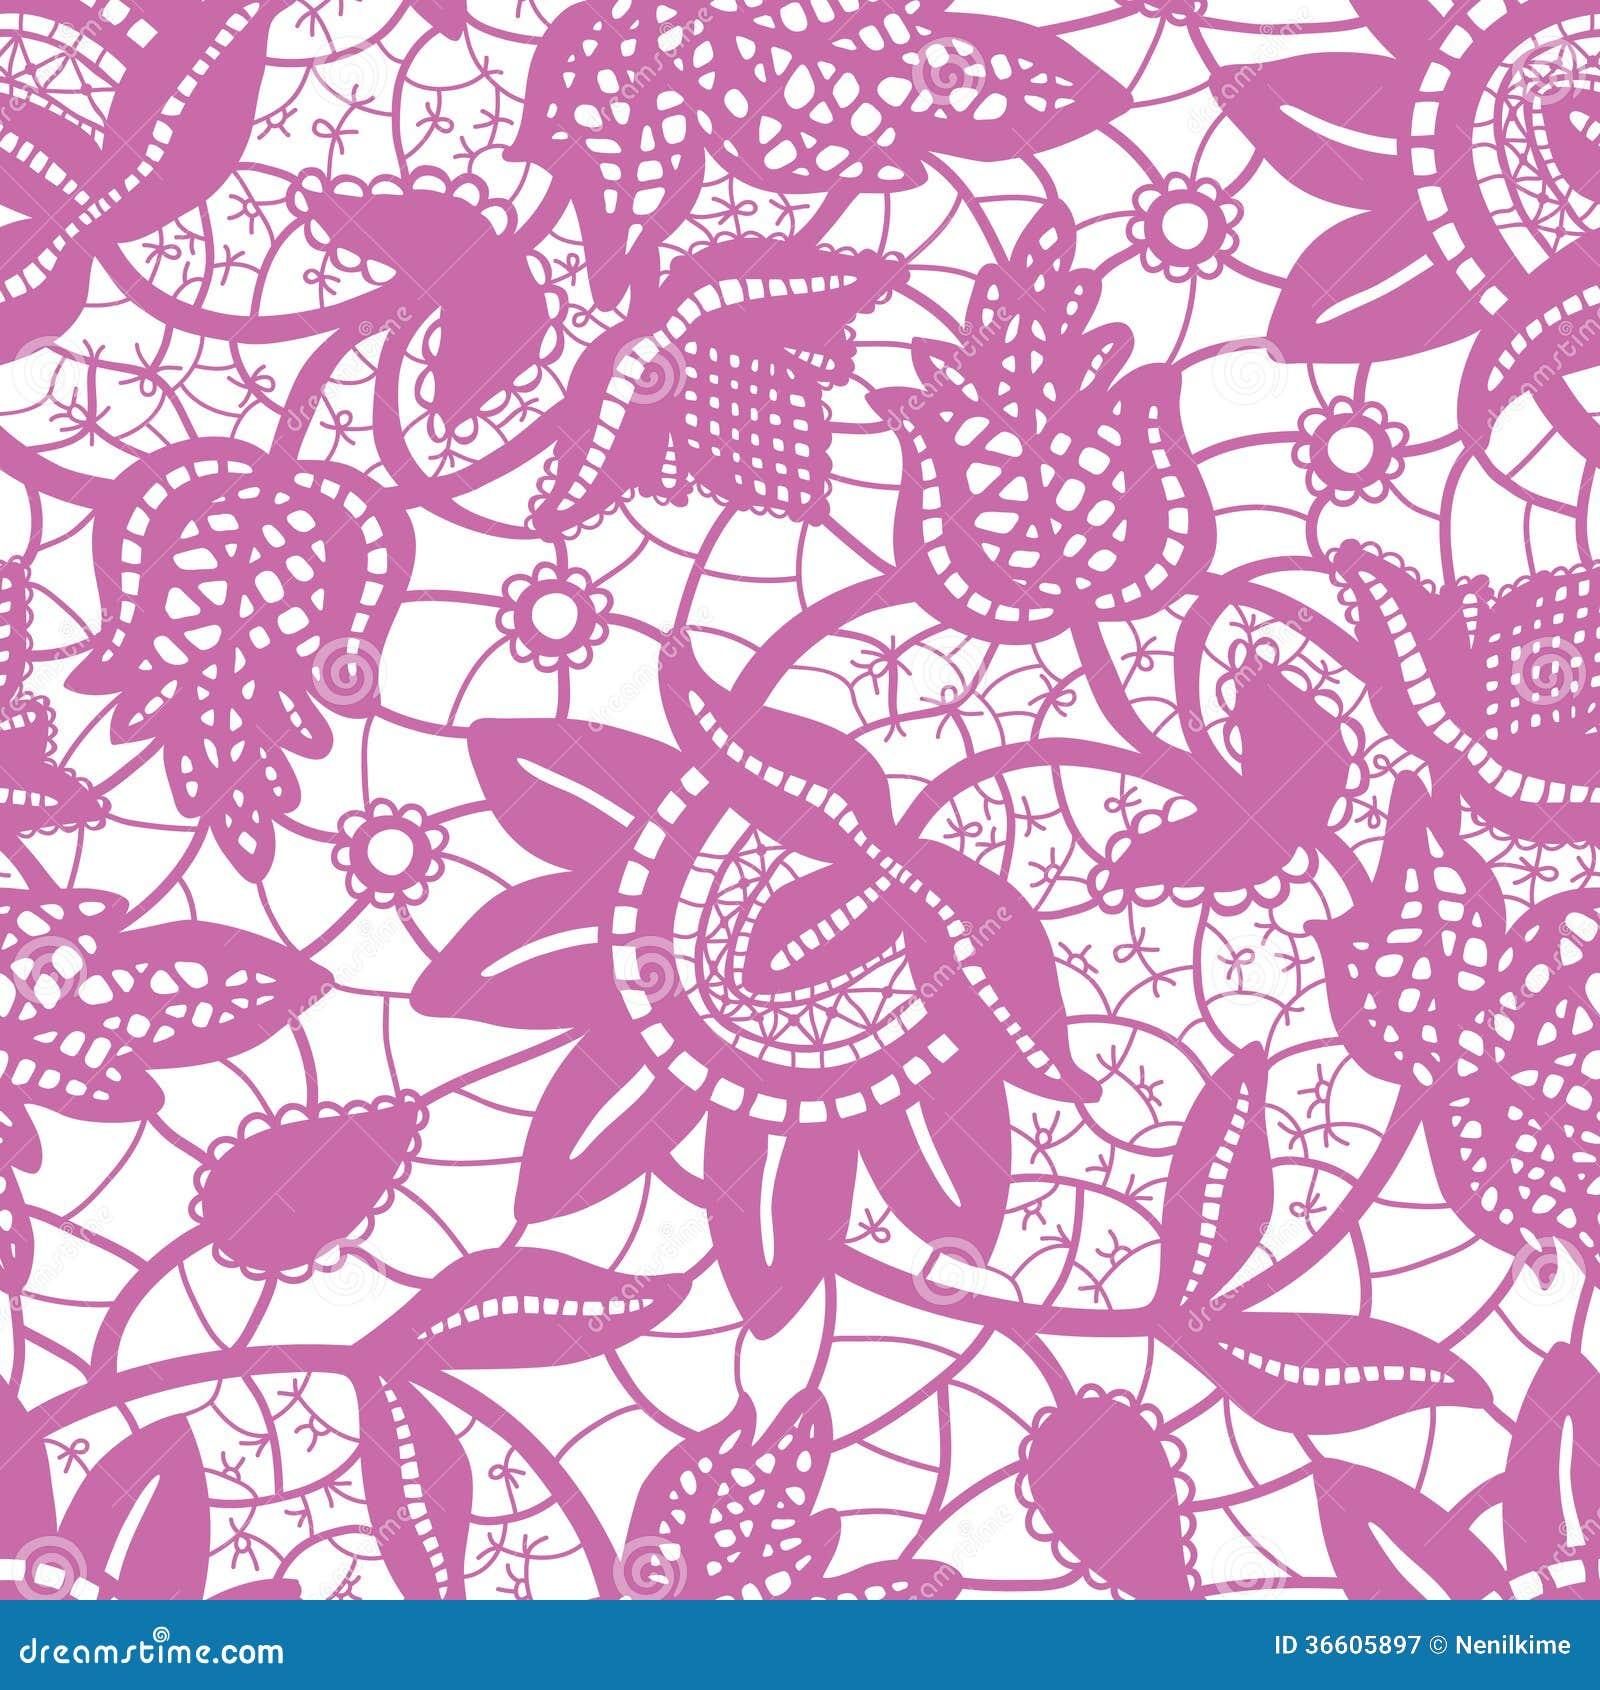 Lavender Background Wedding: Magic Purple Lace Seamless Background Royalty Free Stock